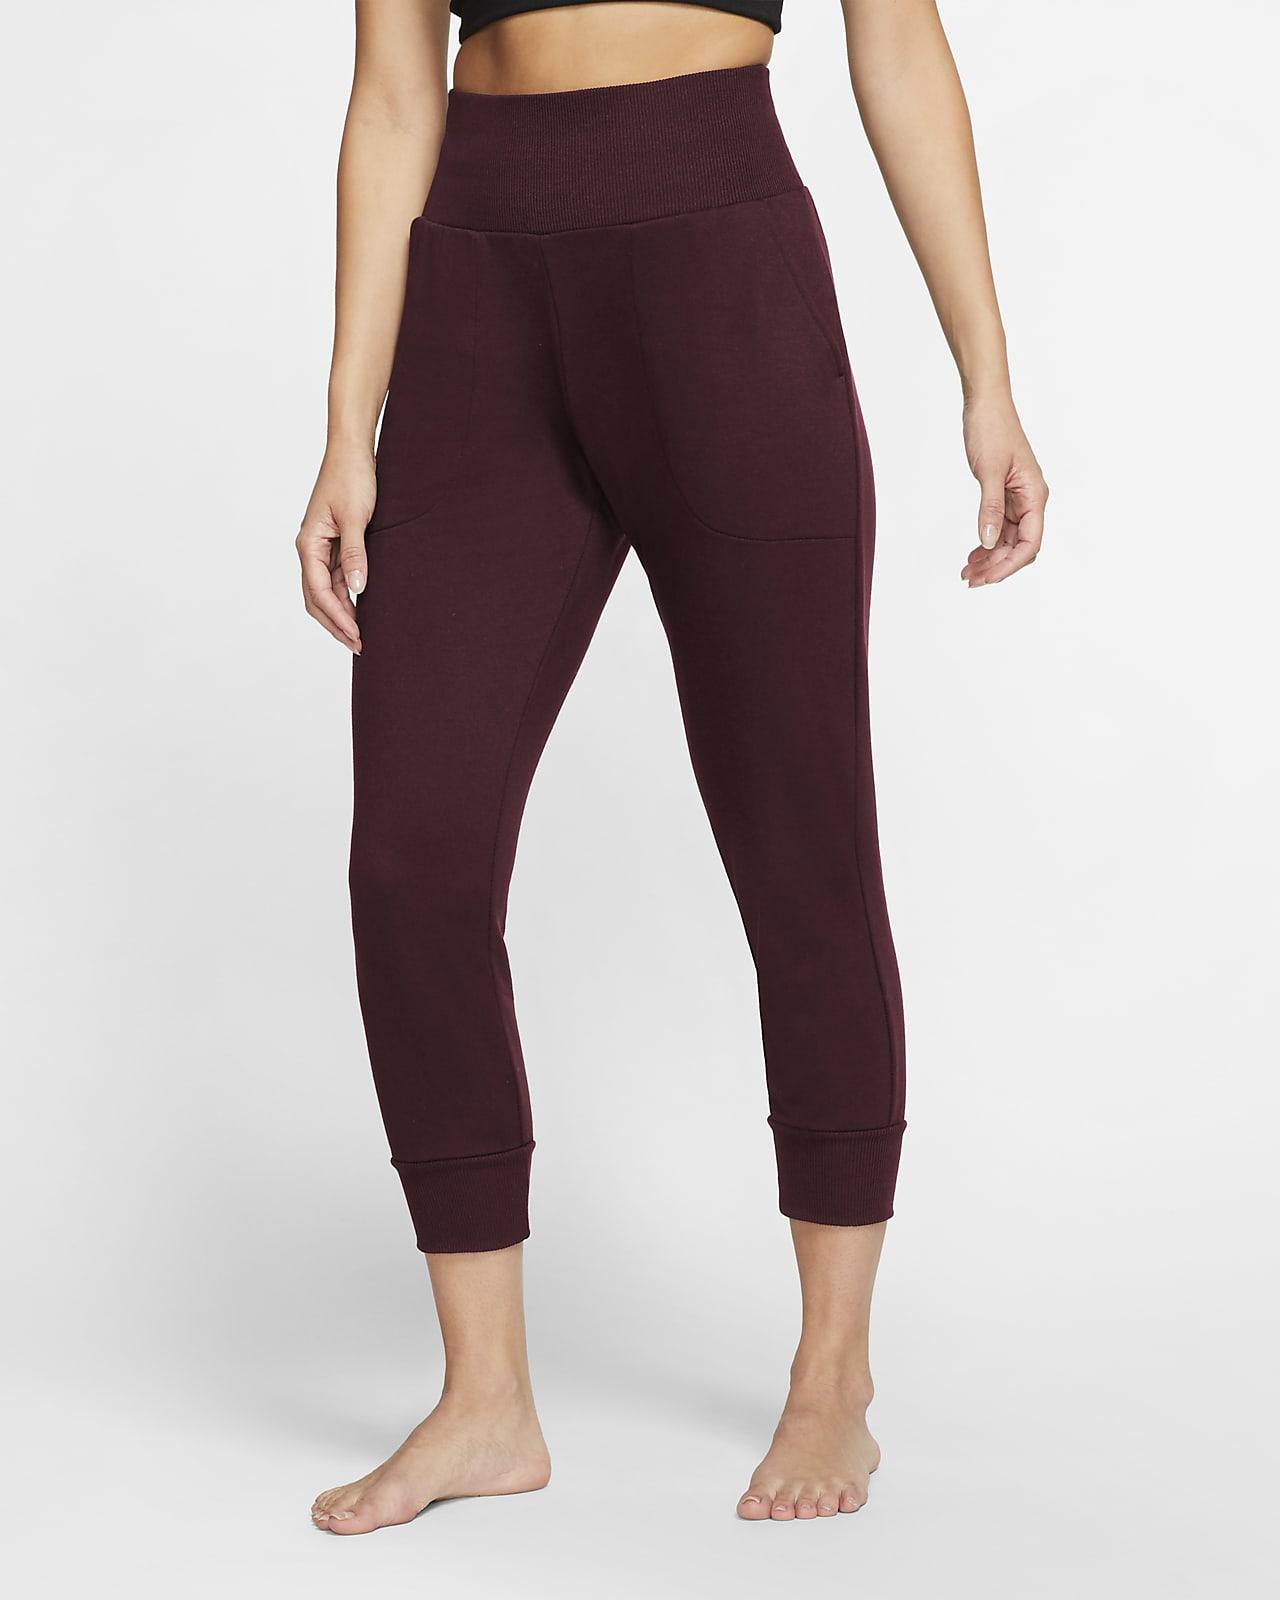 cebolla jurado soporte  Nike Yoga Women's Pants. Nike.com